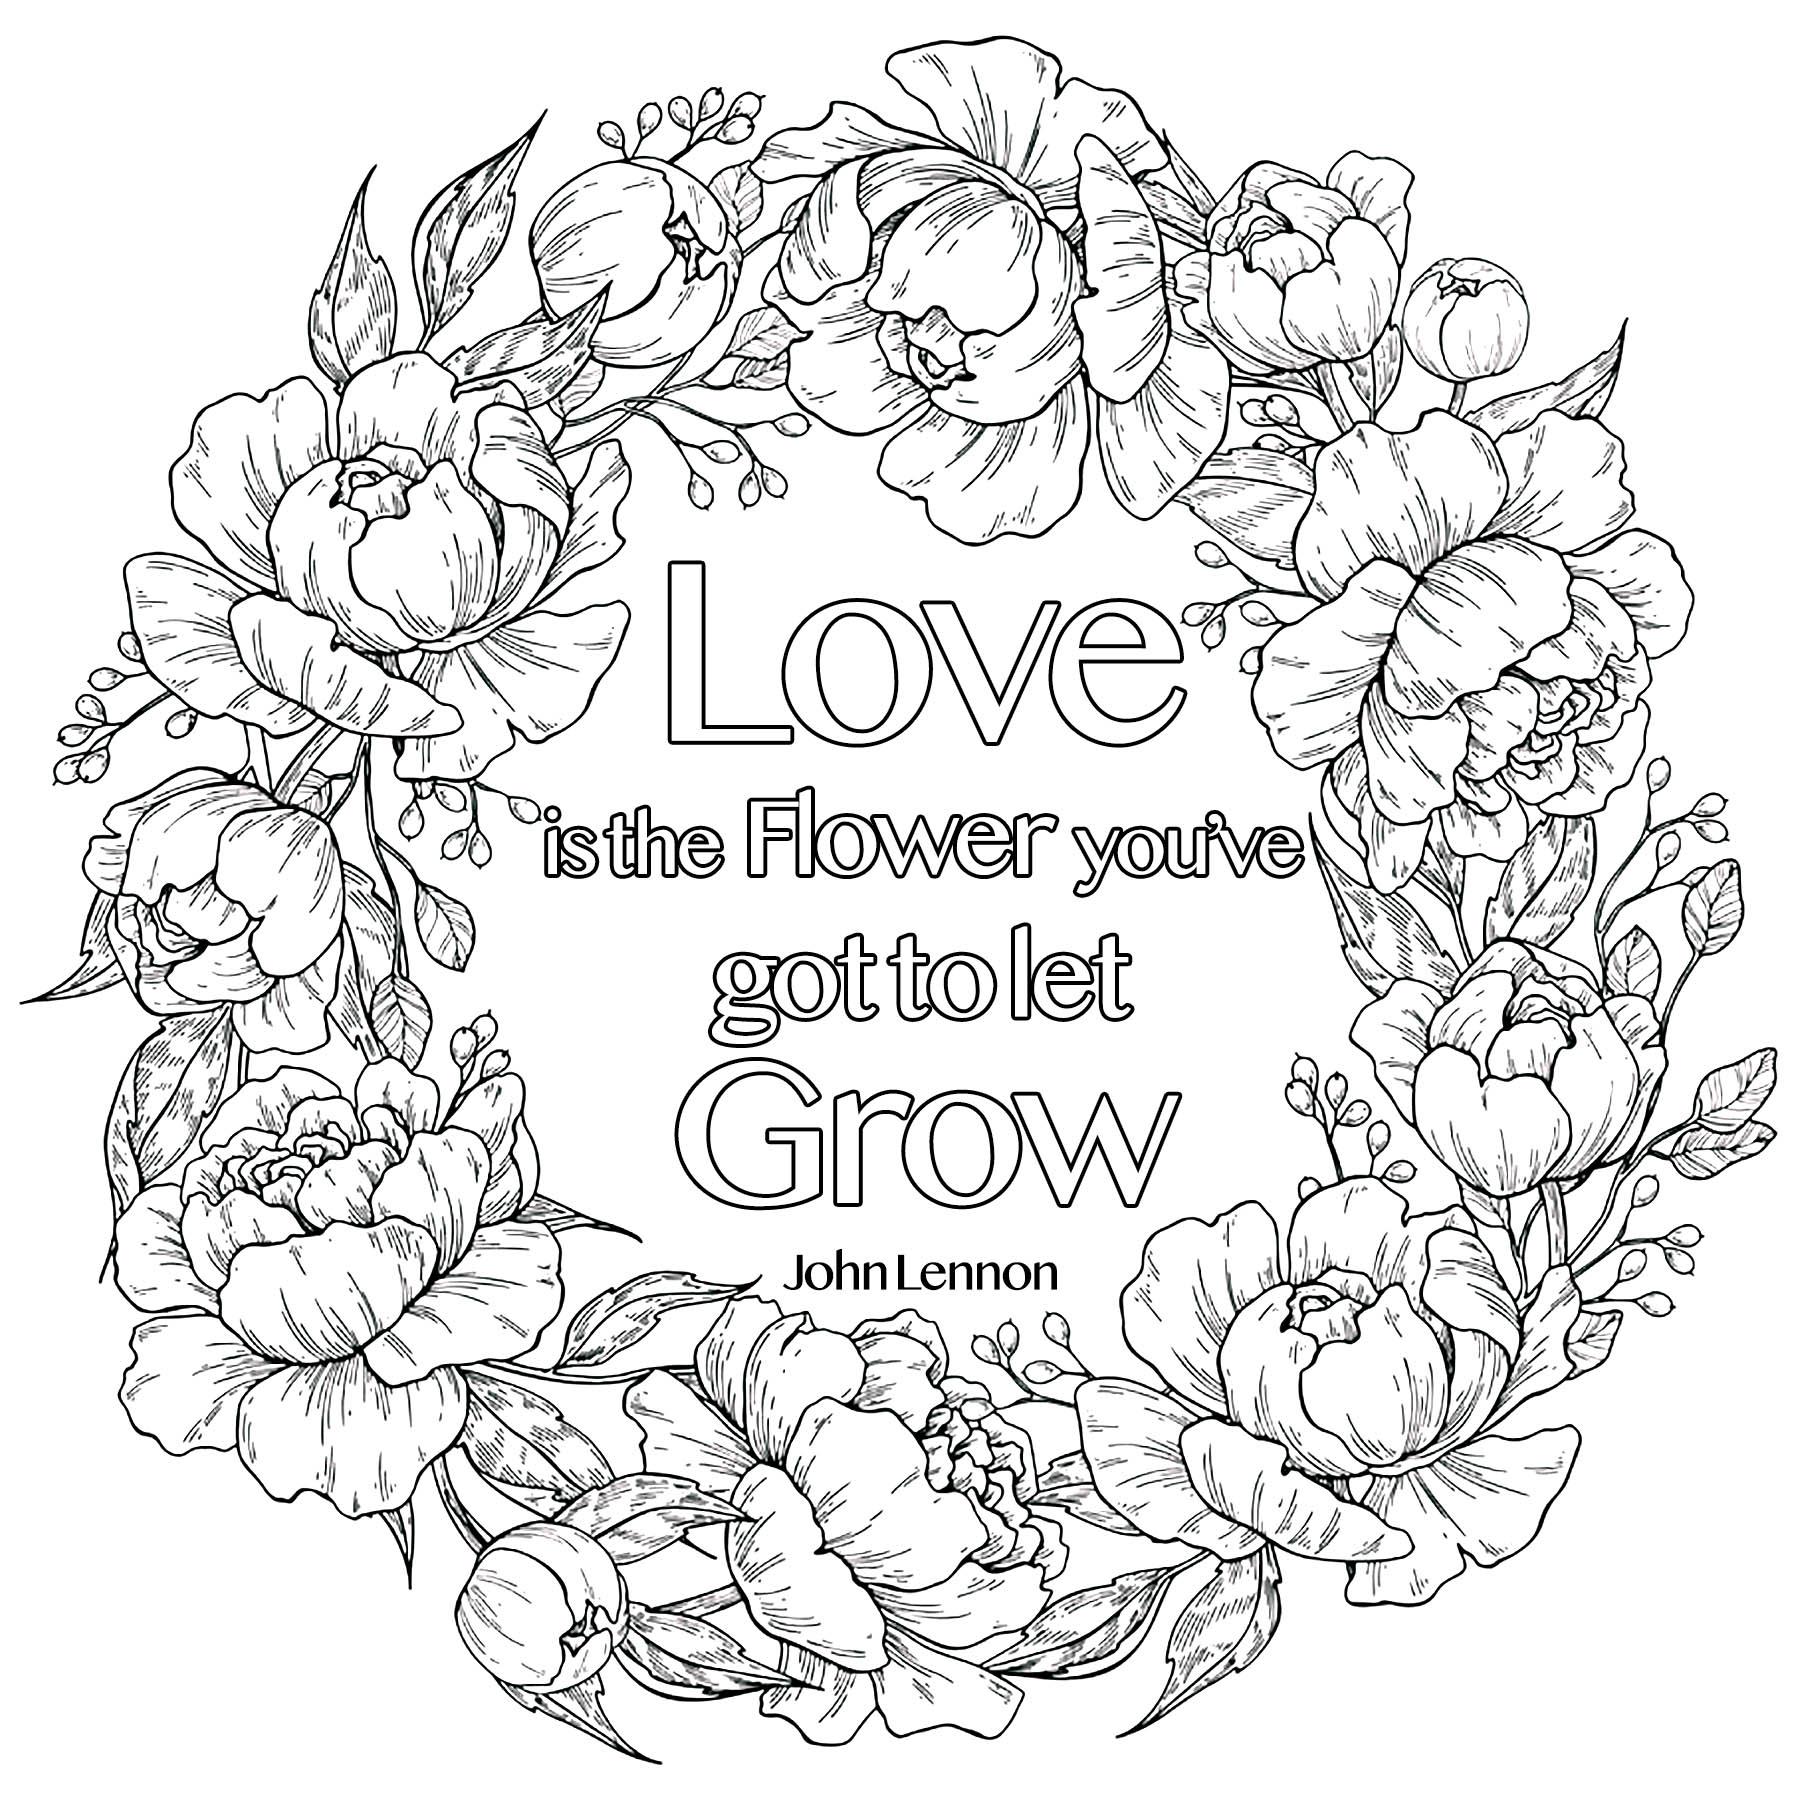 Love is the Flower you've got to let grow, John Lennon (in a flower crown)